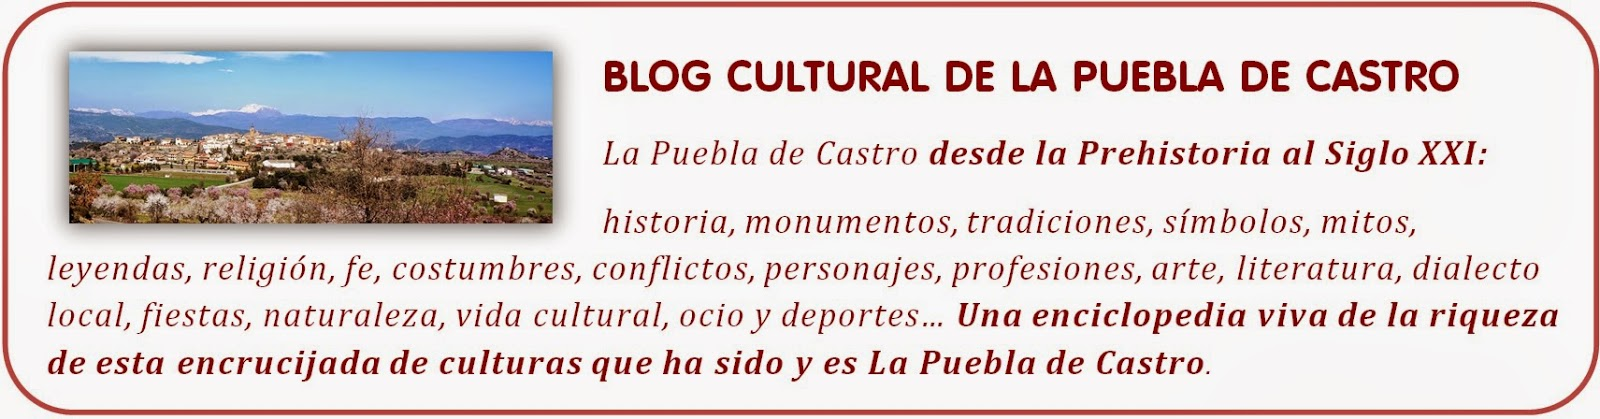 http://puebladecastro.blogspot.com.es/